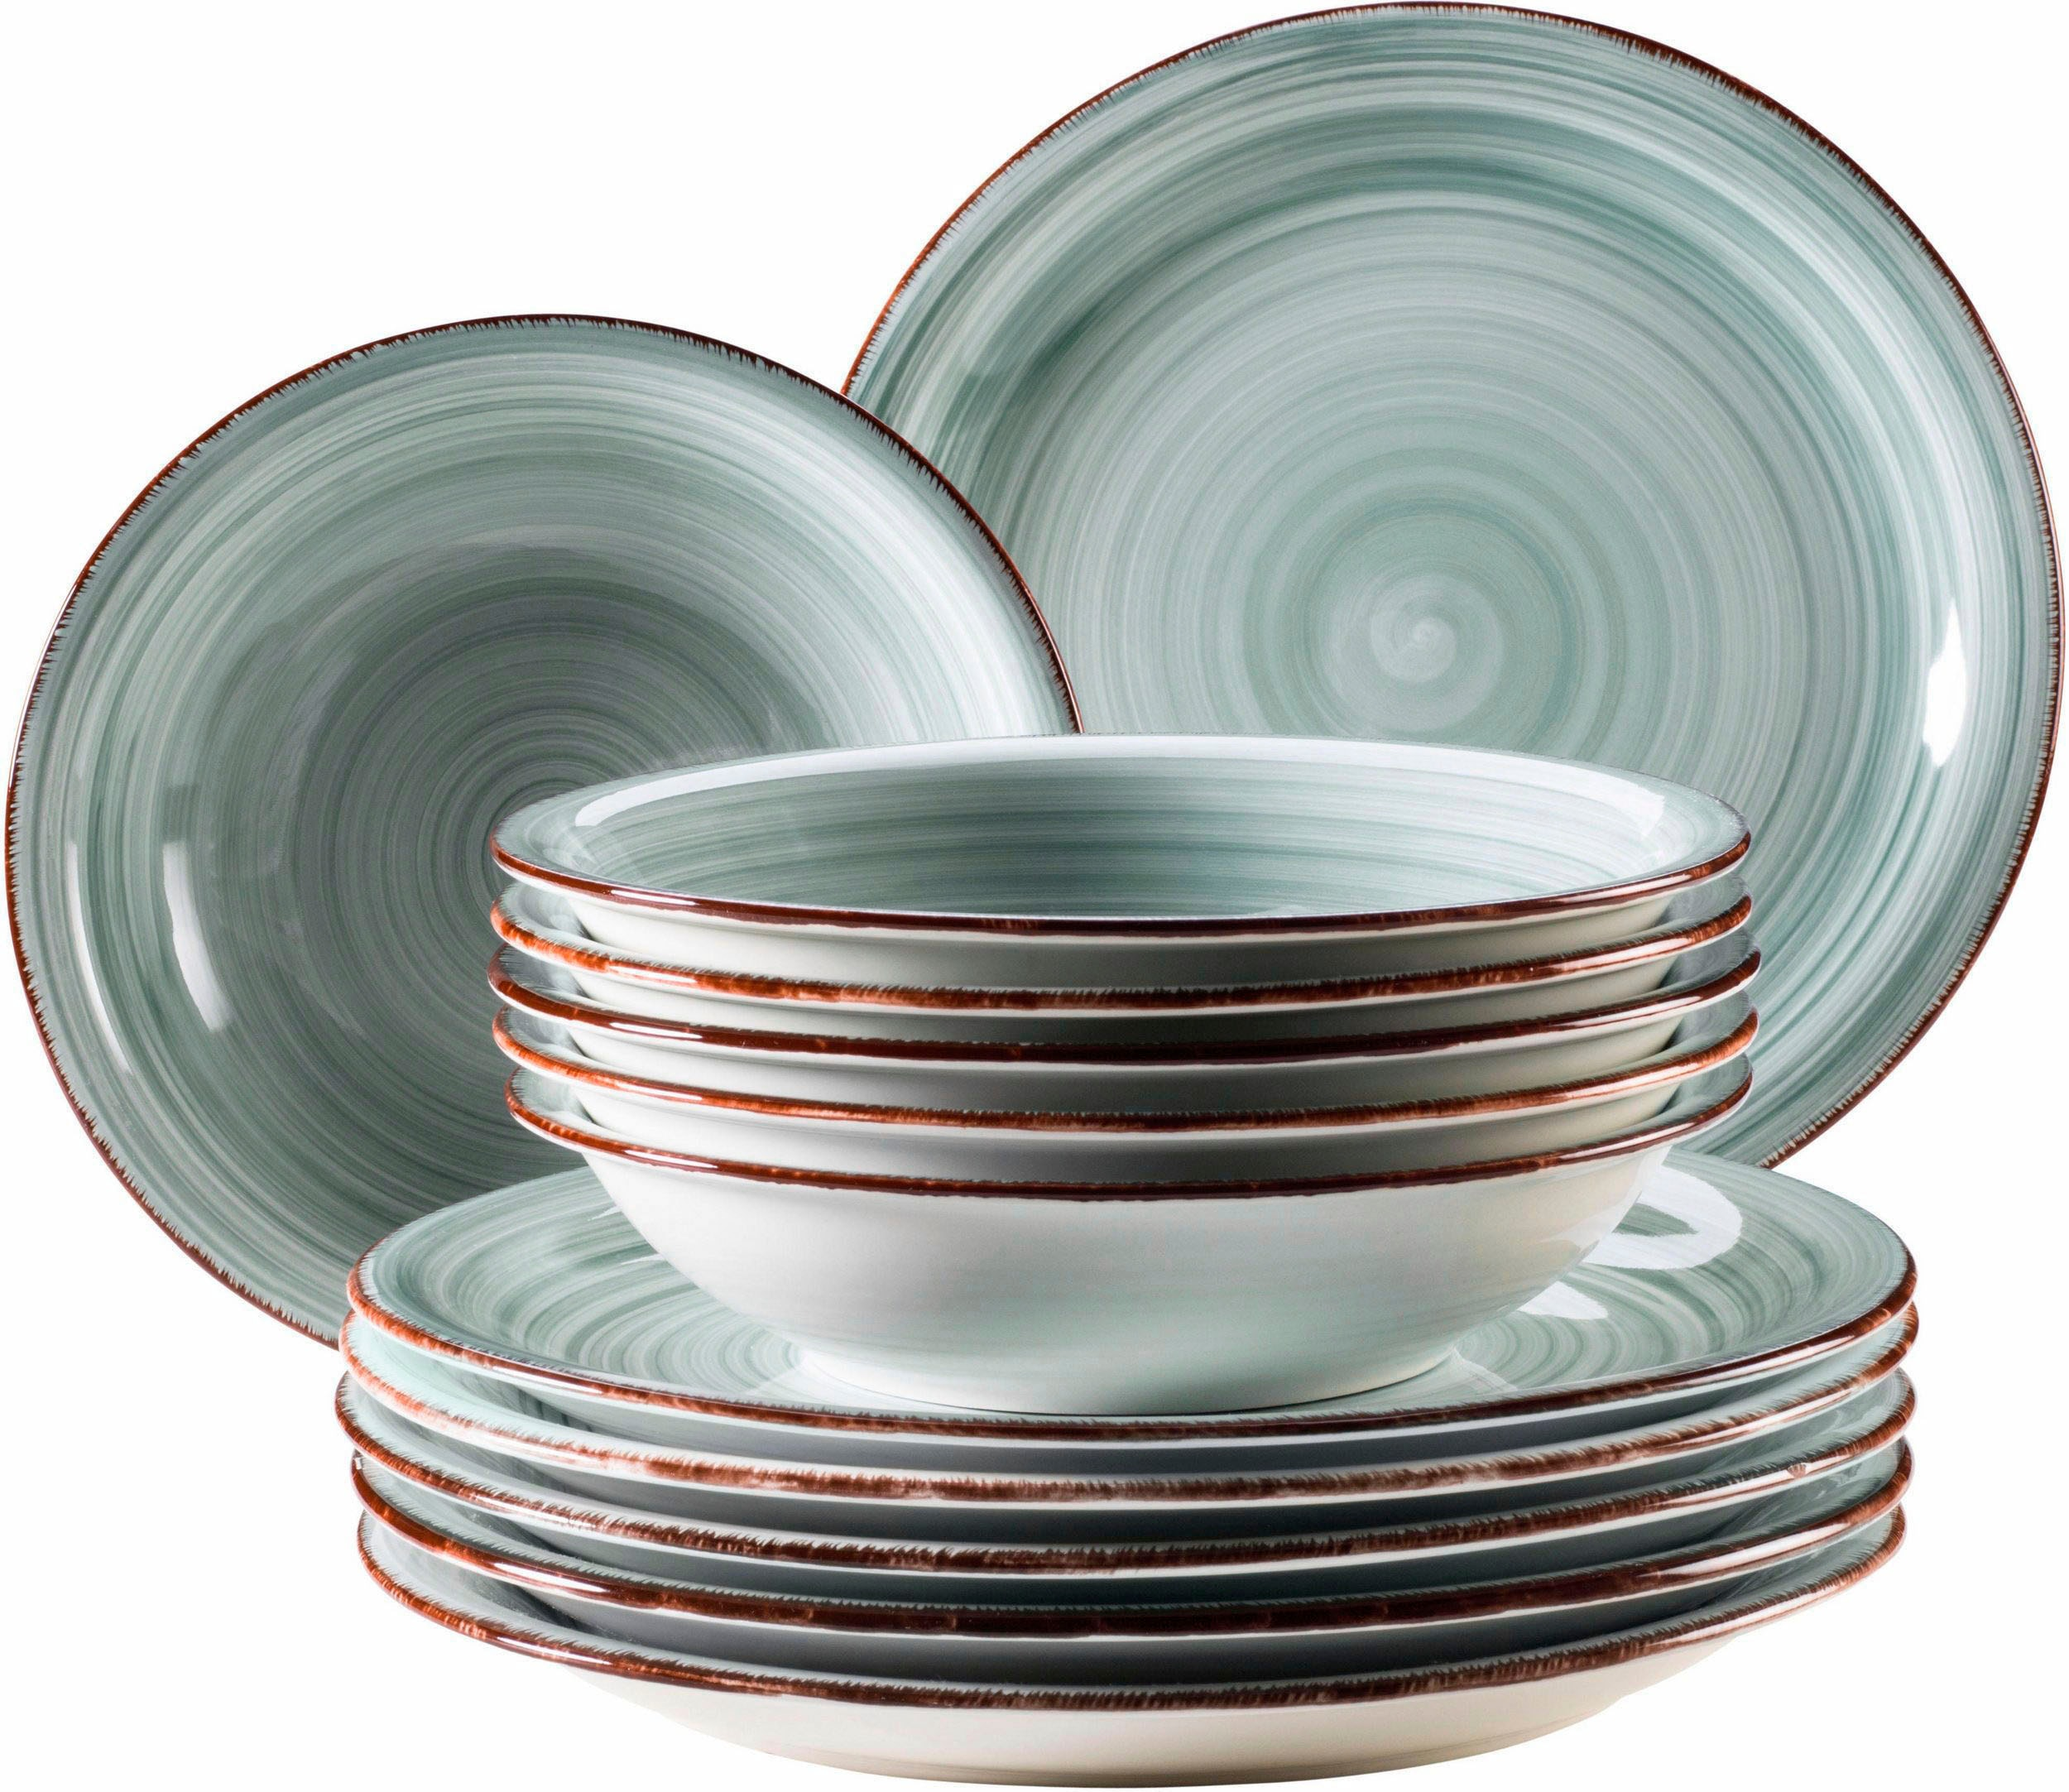 home affaire tafelservice bel tempo 12 tlg keramik. Black Bedroom Furniture Sets. Home Design Ideas